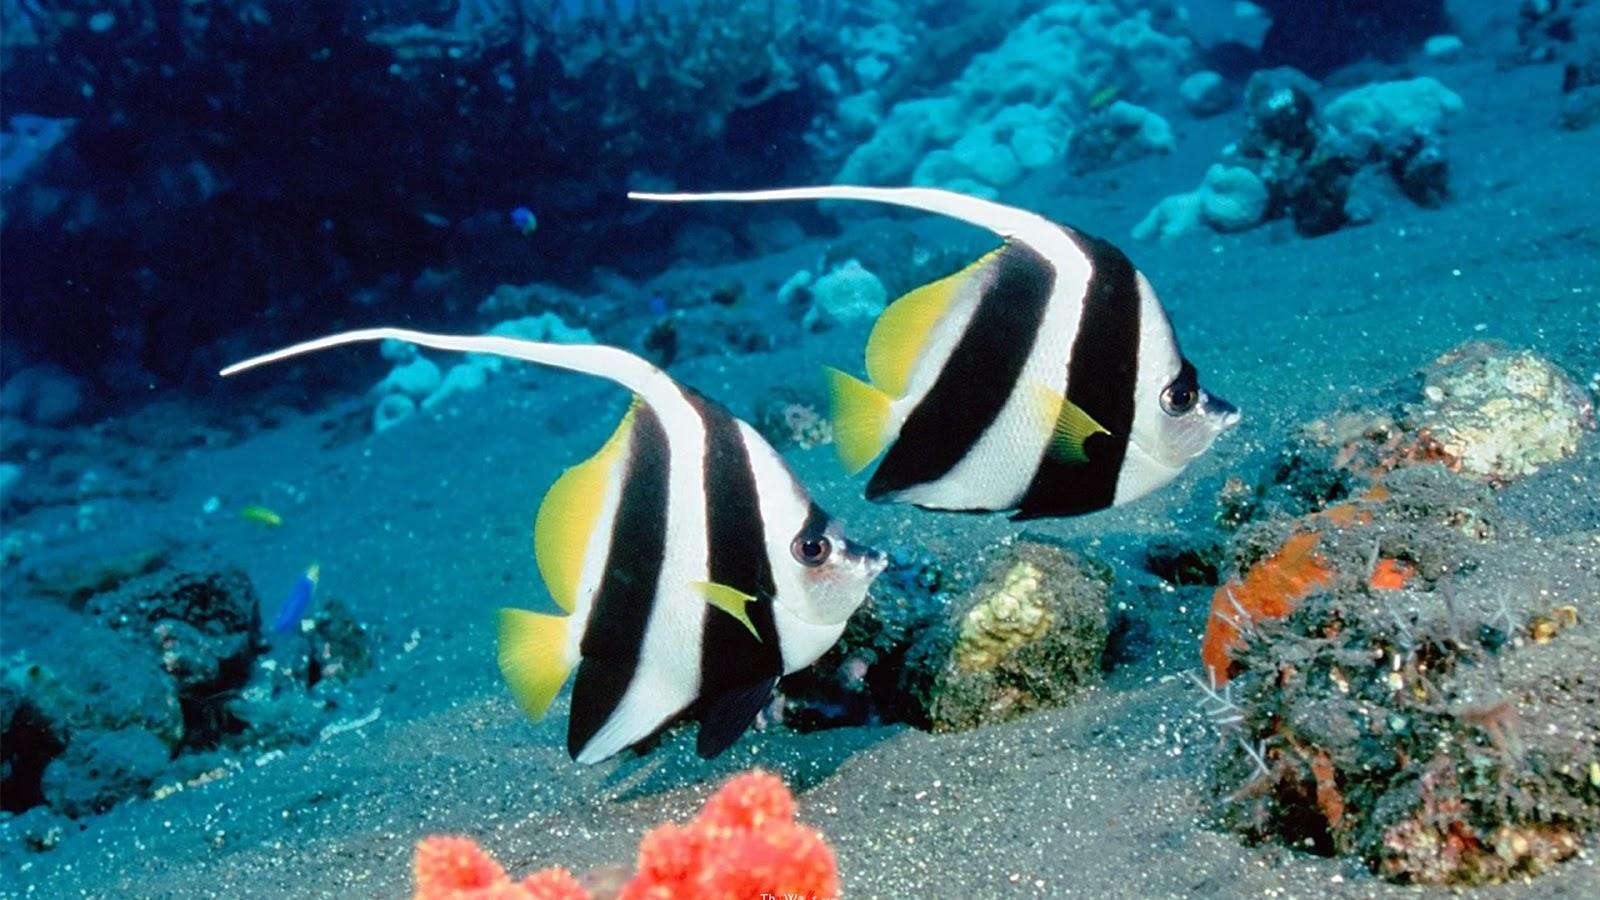 sea fish 3 - seourpicz Beautiful Sea Fish Wallpaper